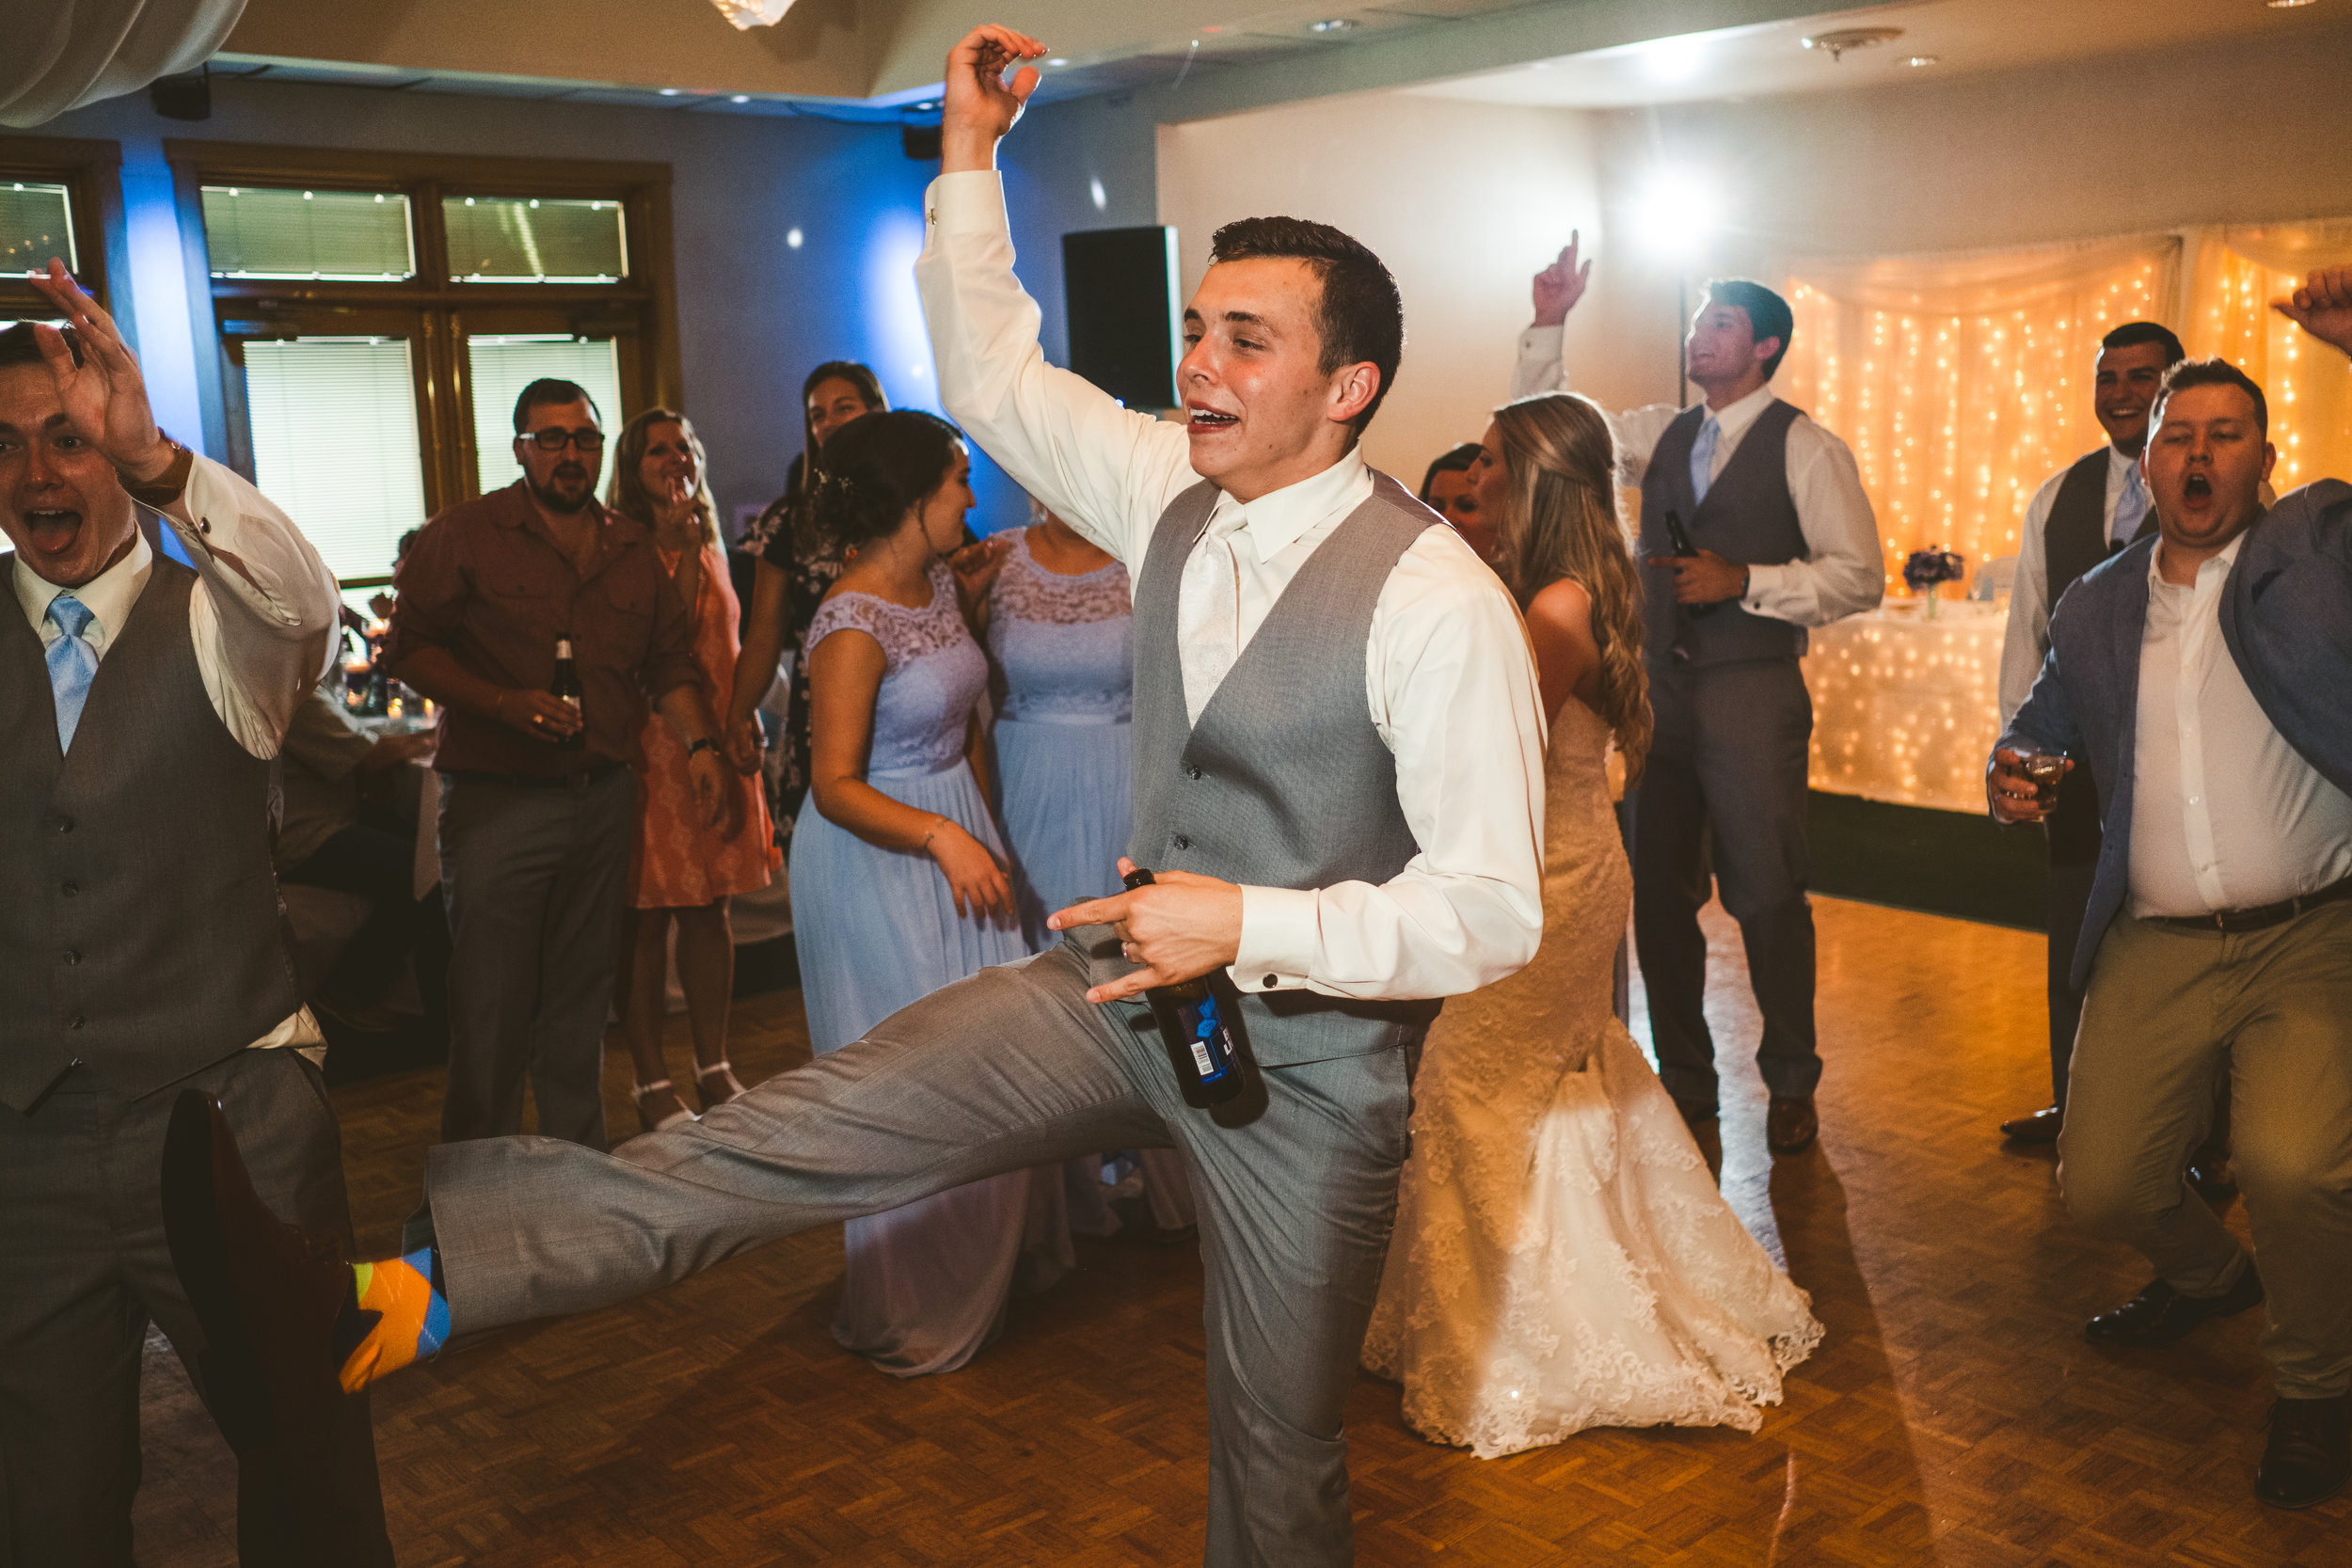 Groom on Dancefloor at Wedding Reception and Toledo Wedding Photographers Capture the Fun